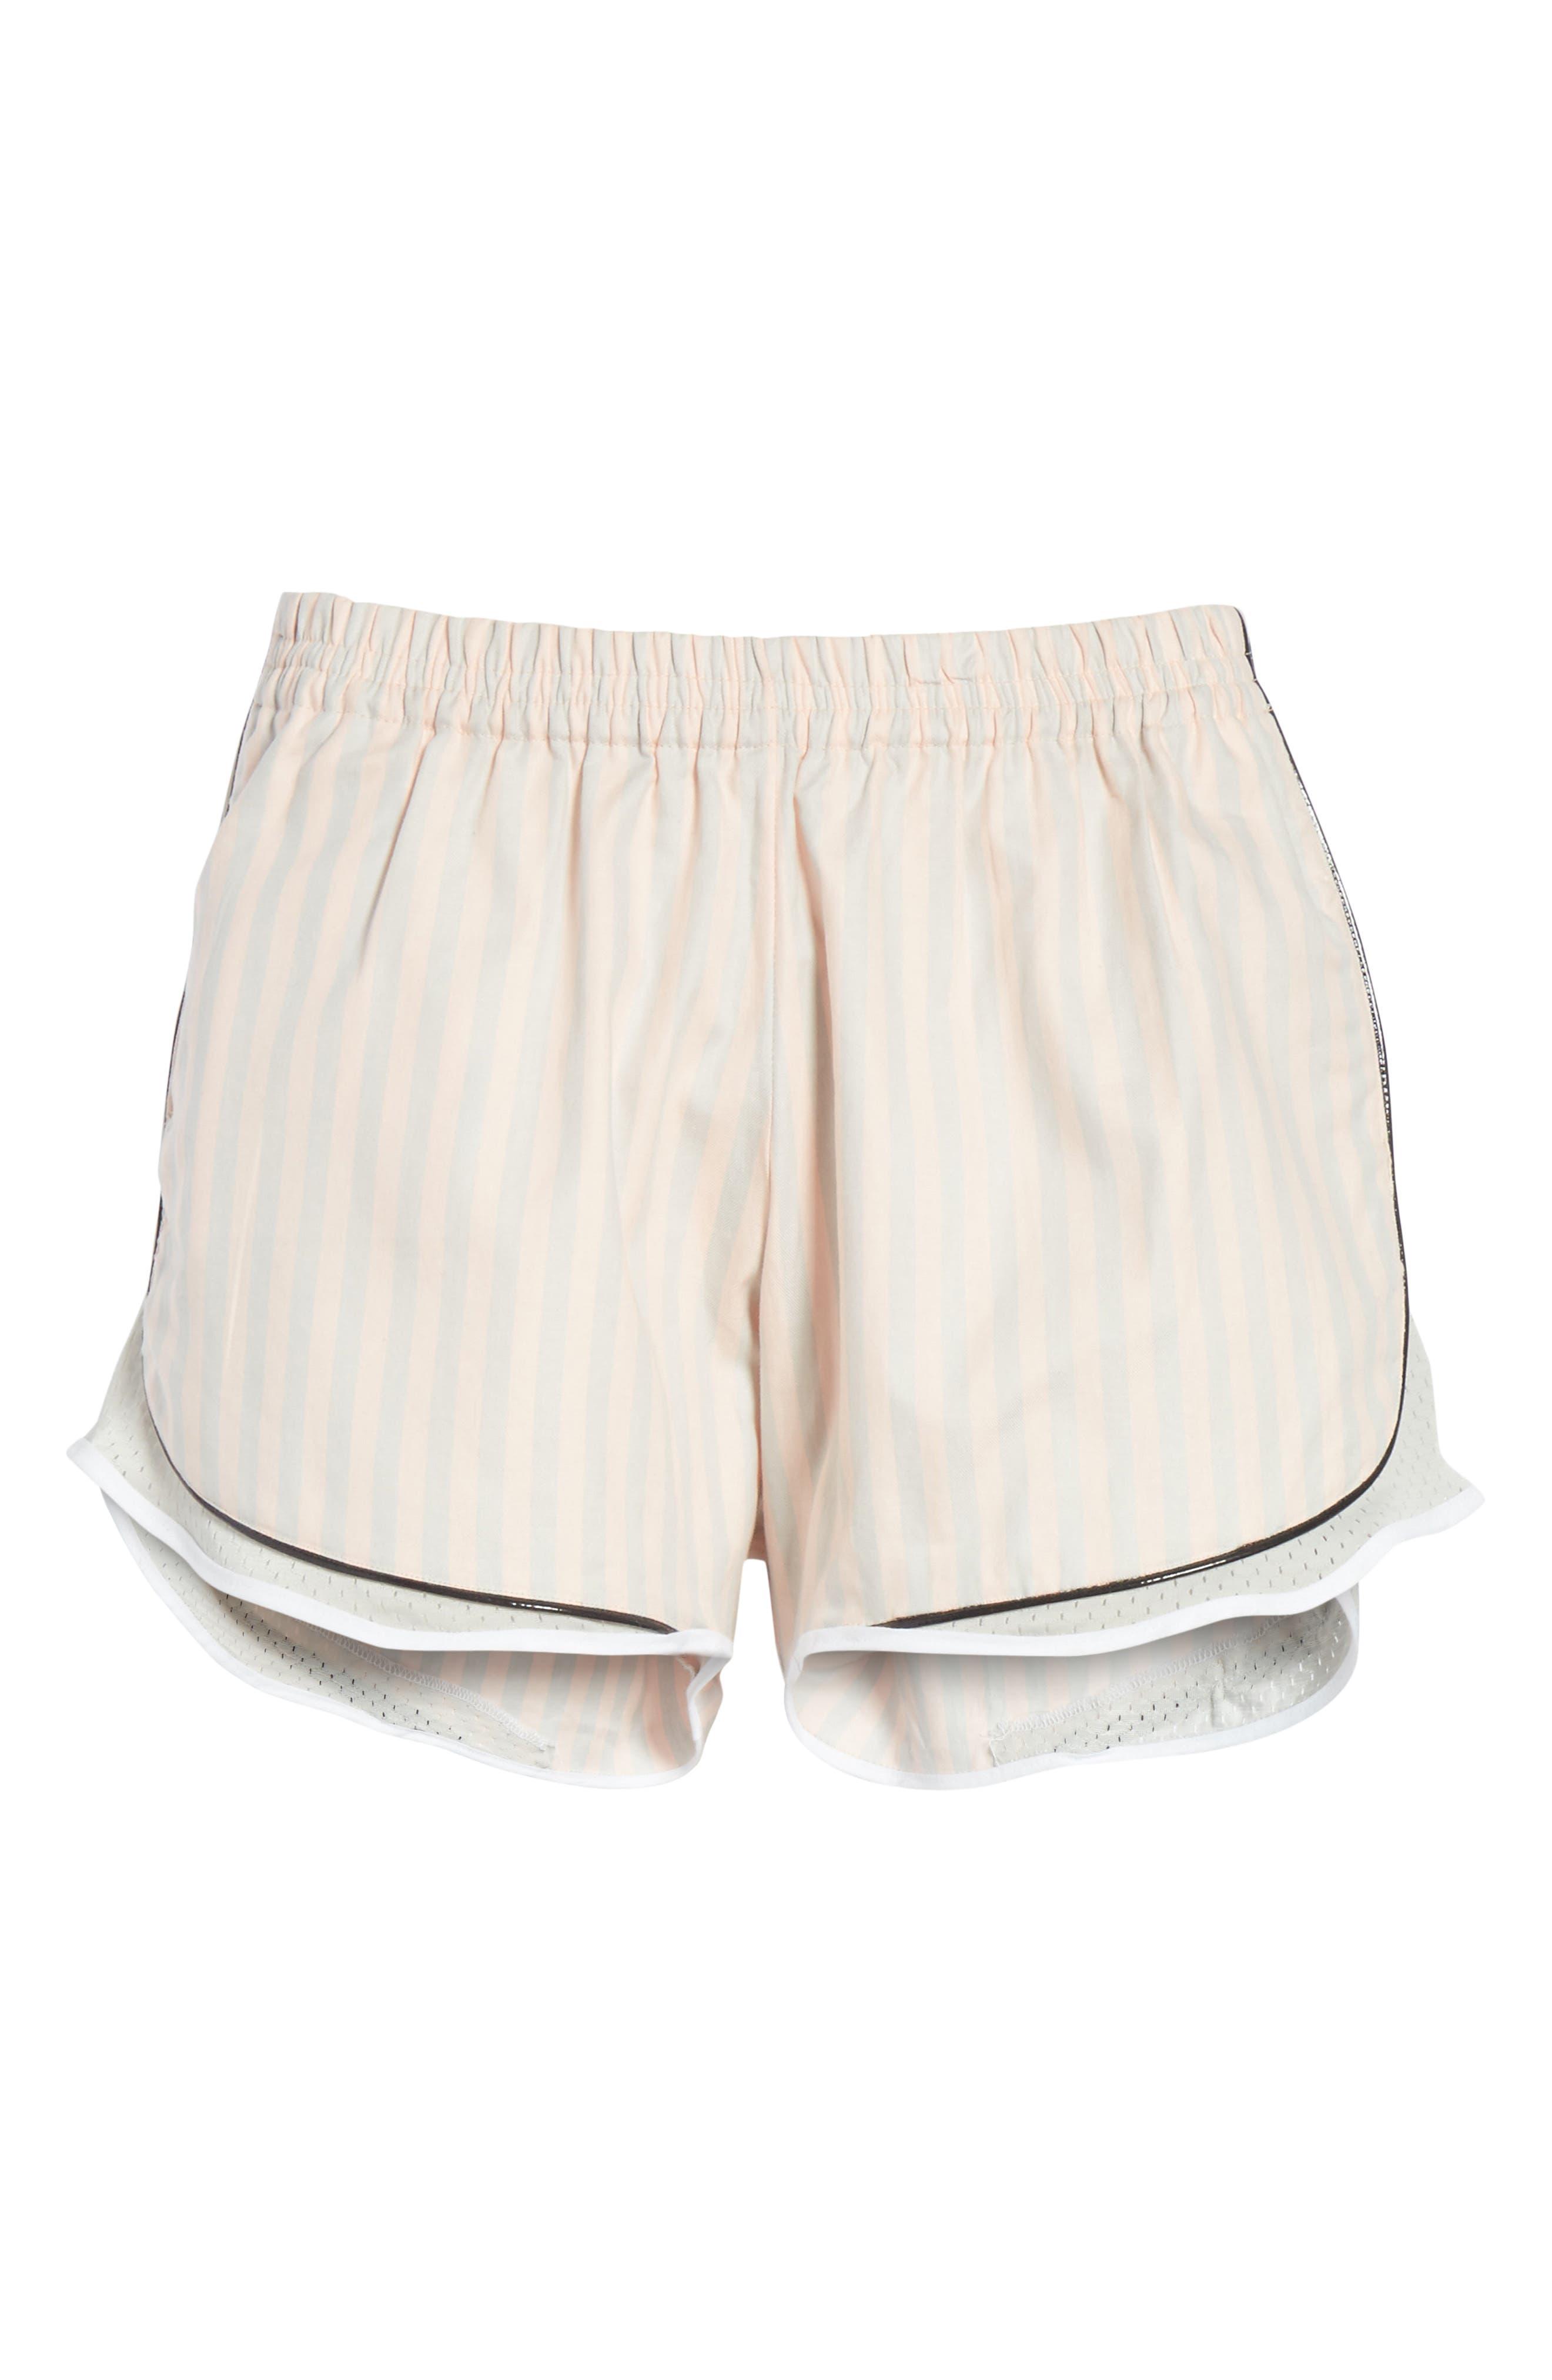 Aina Poplin Shorts,                             Alternate thumbnail 6, color,                             020